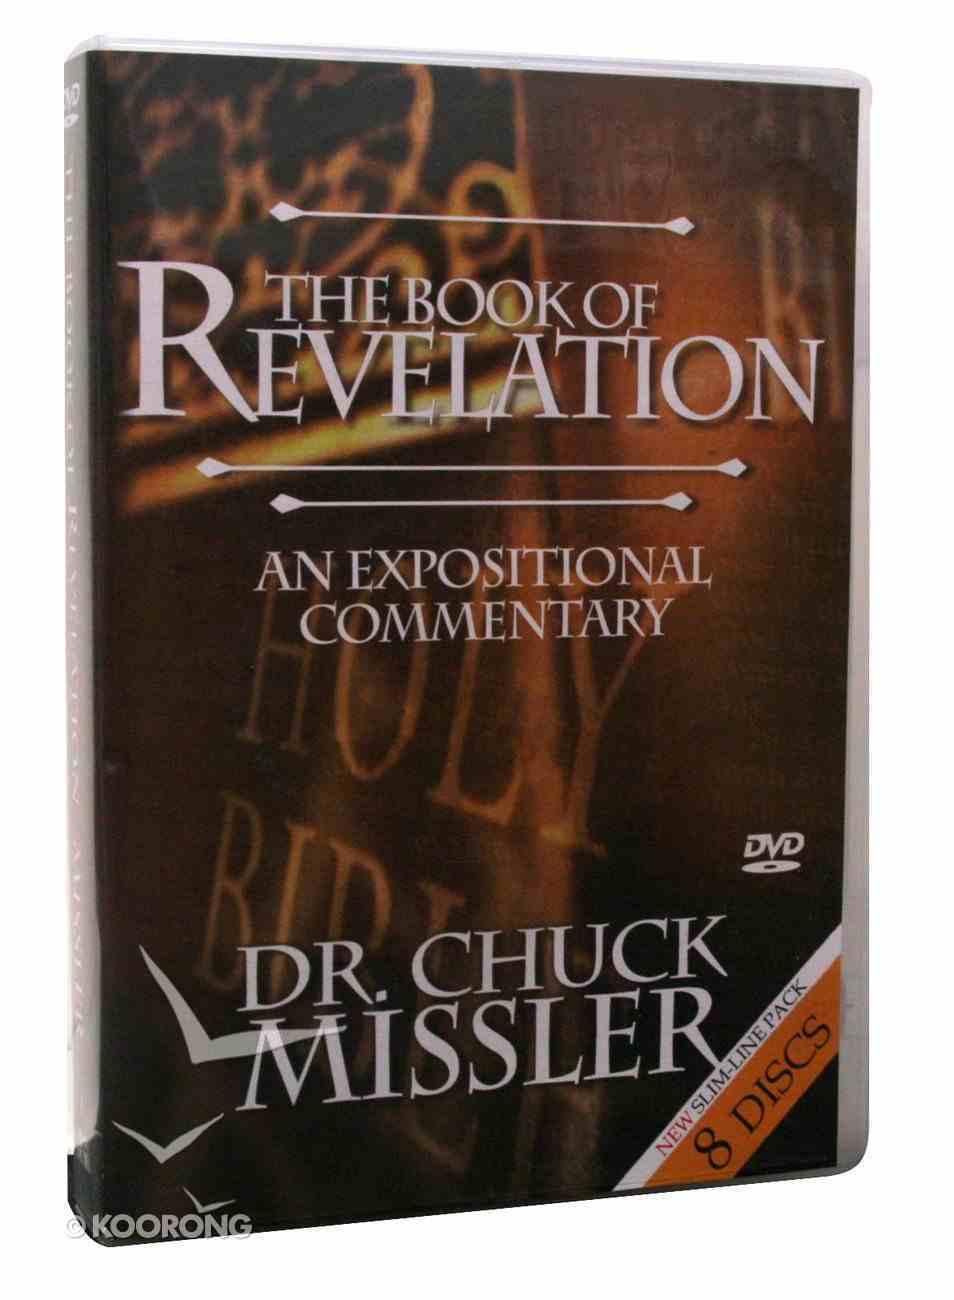 The Book of Revelation Commentary (8 Dvd Set) DVD